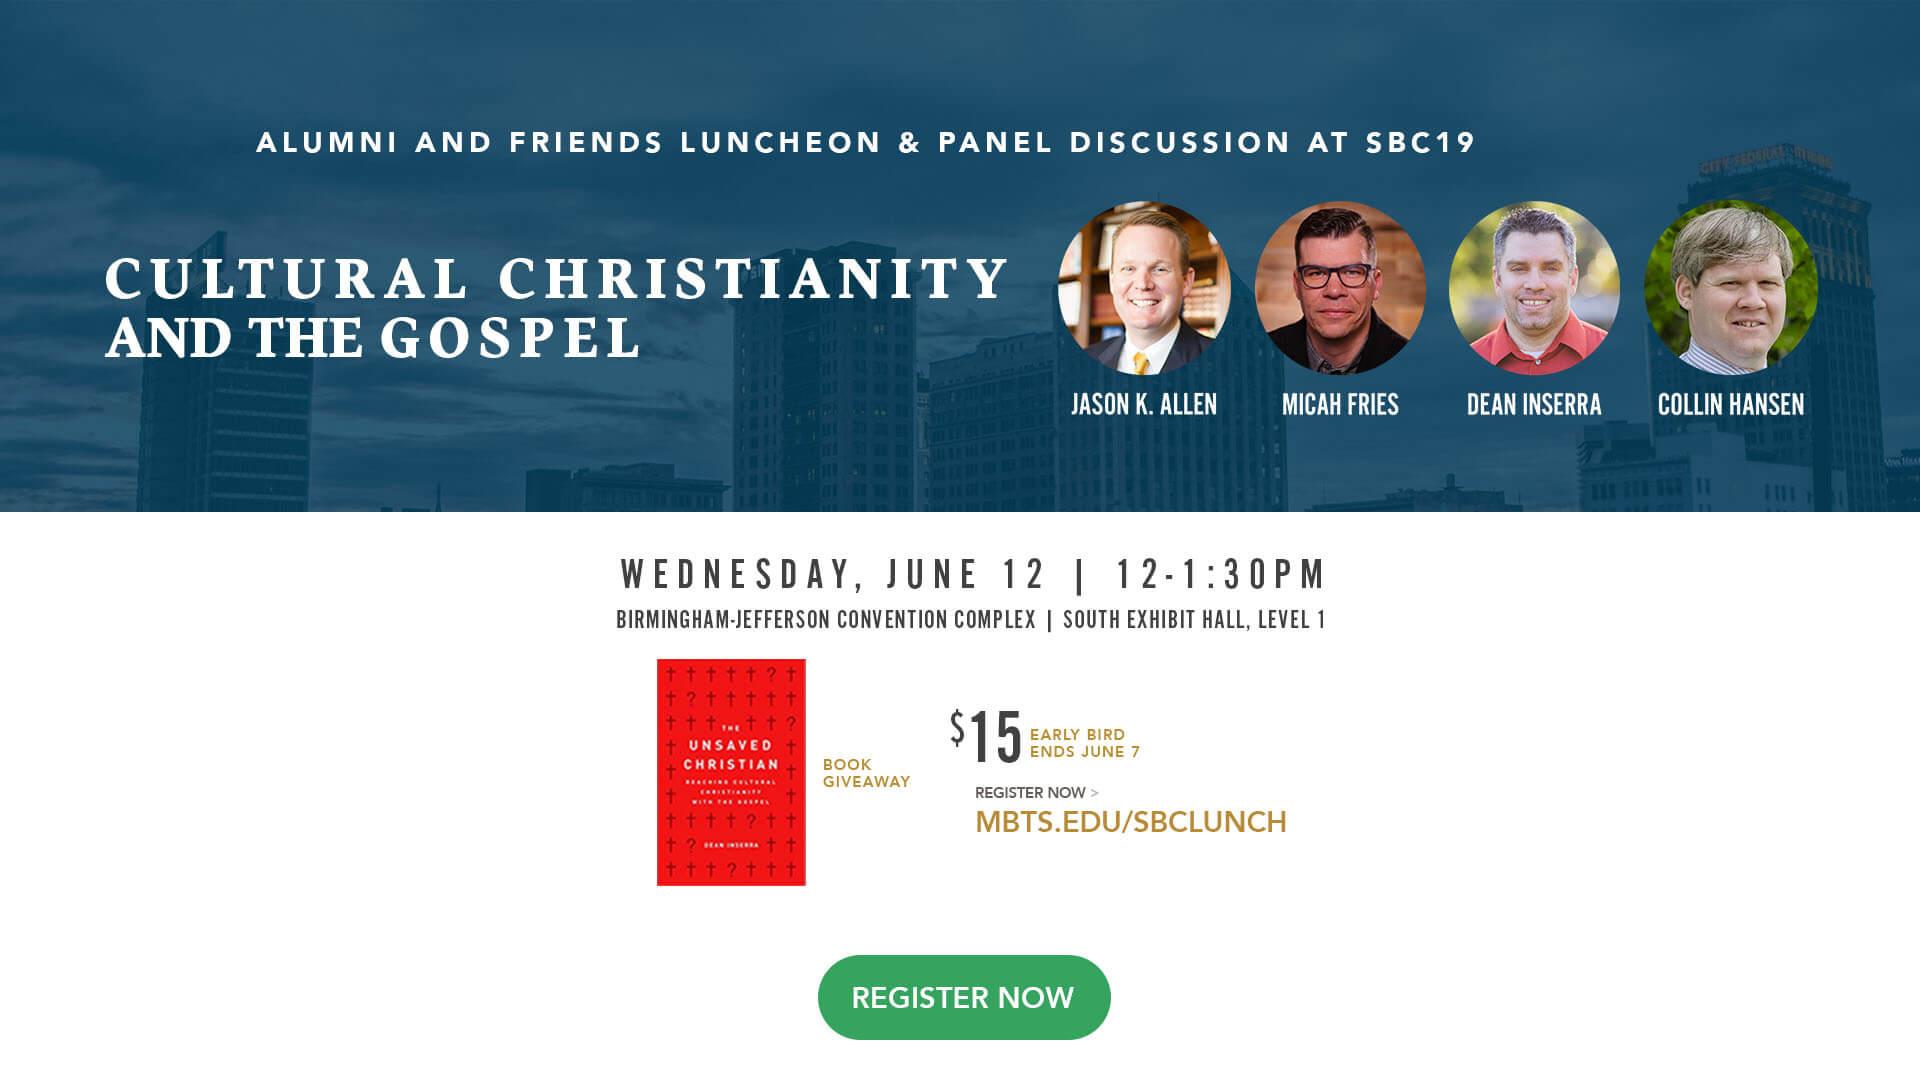 2019 Alumni and Friend Luncheon at SBC, June 12